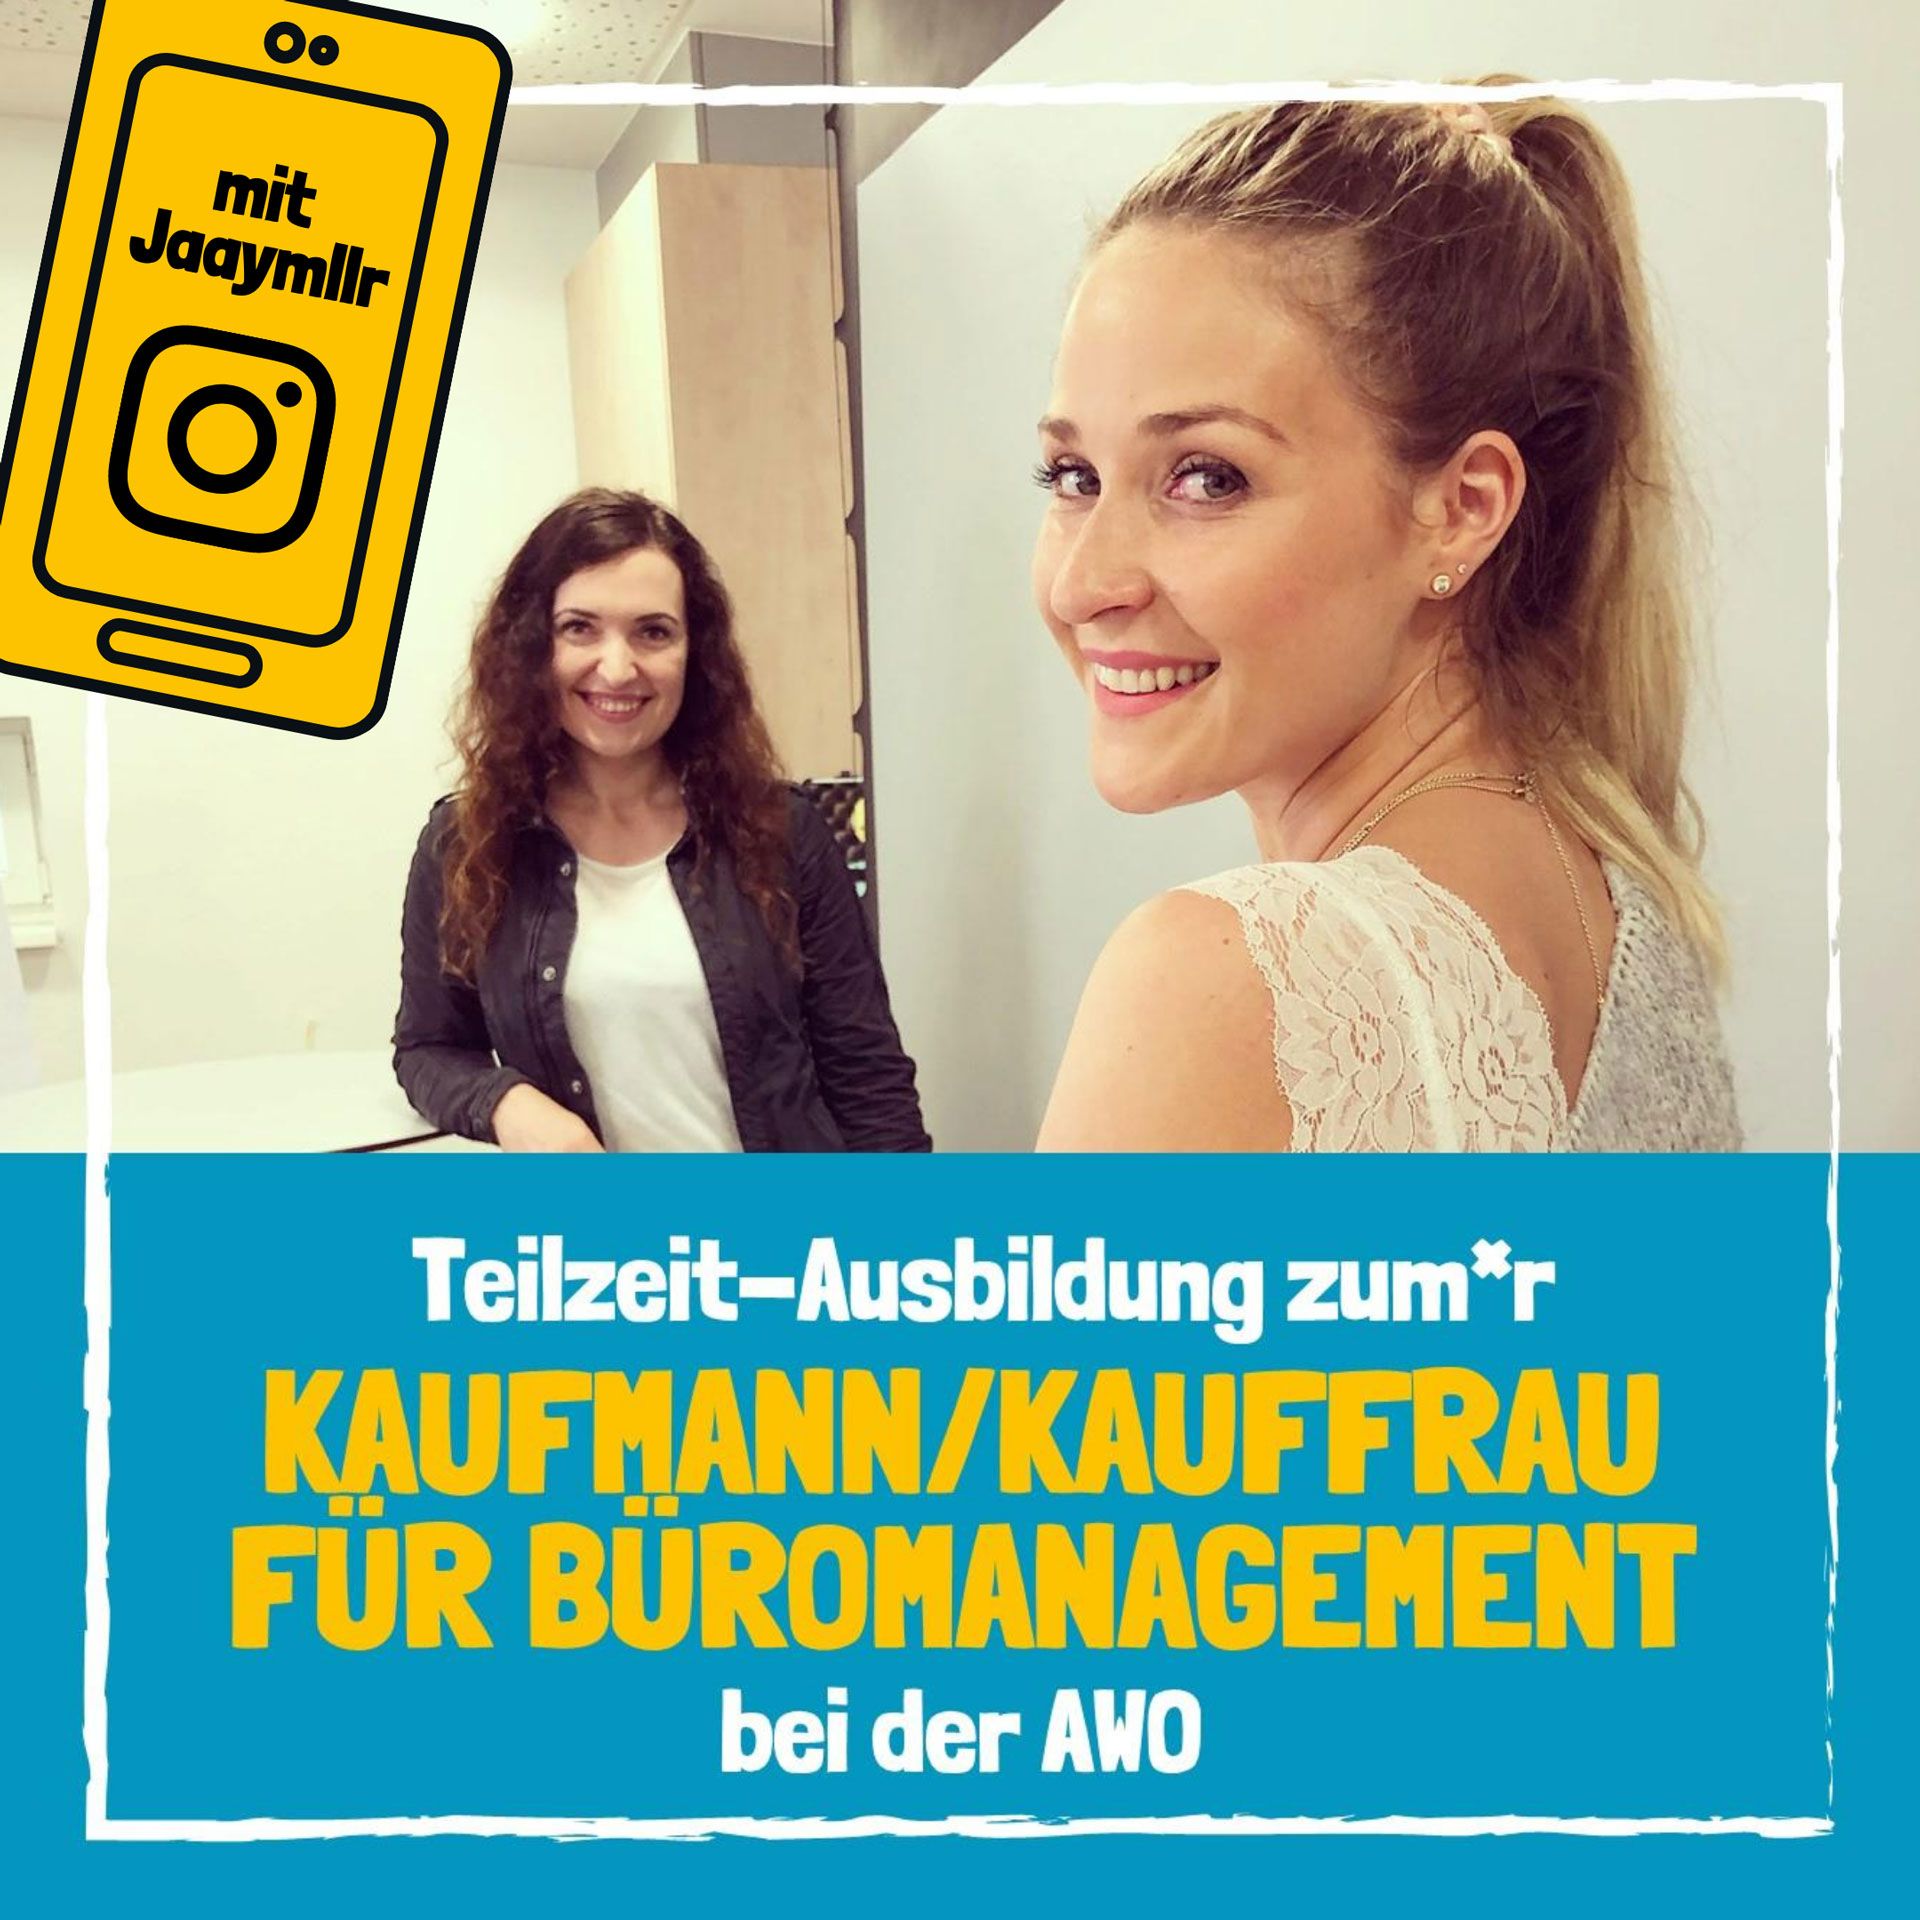 kaufmann-kauffrau-bueromanagement